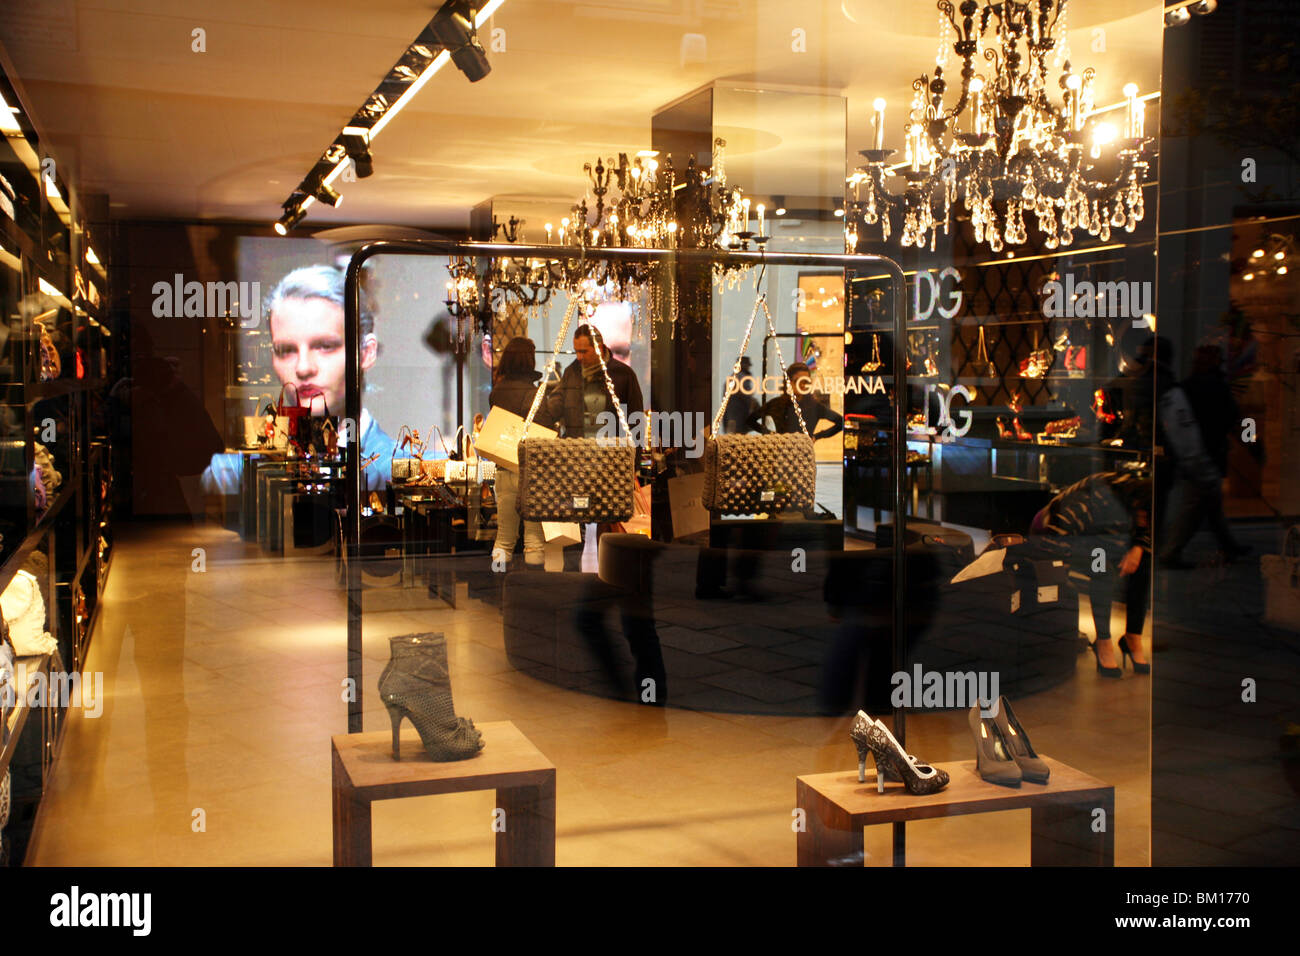 Dolce & Gabbana store, Corso Venezia 15 street, Milan, Lombardy, Italy, Europe - Stock Image